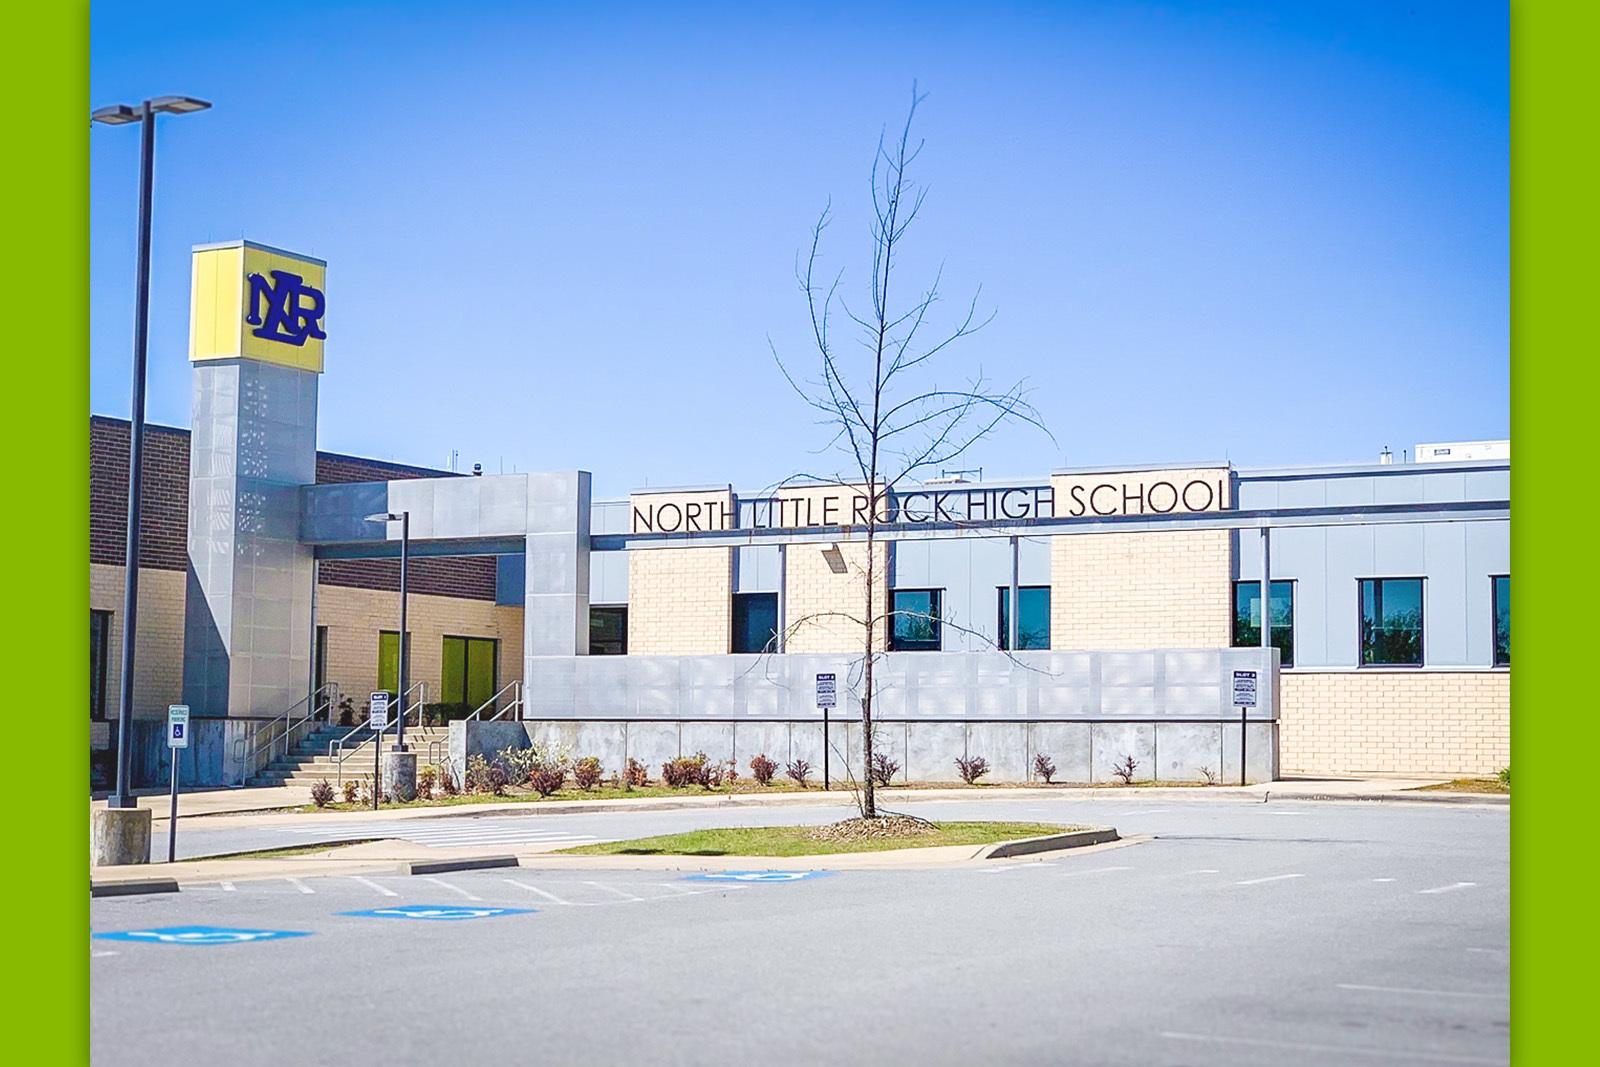 North Little Rock High School